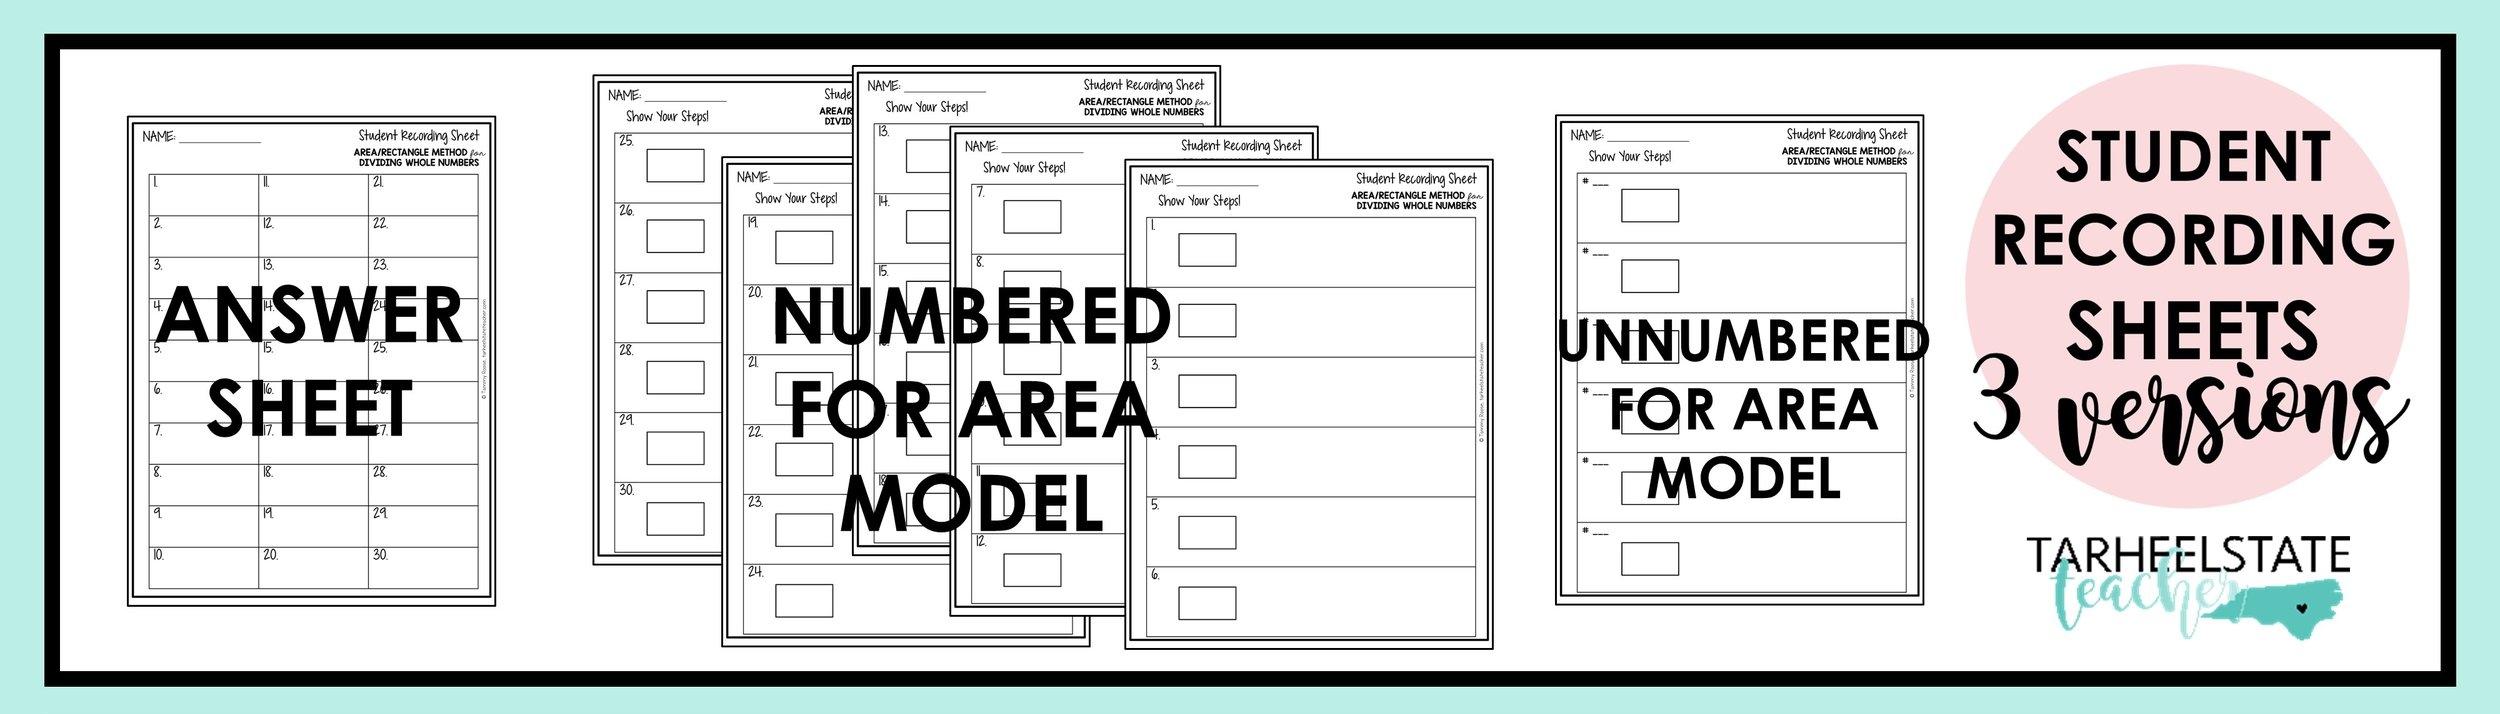 area model task card recording sheets.jpg